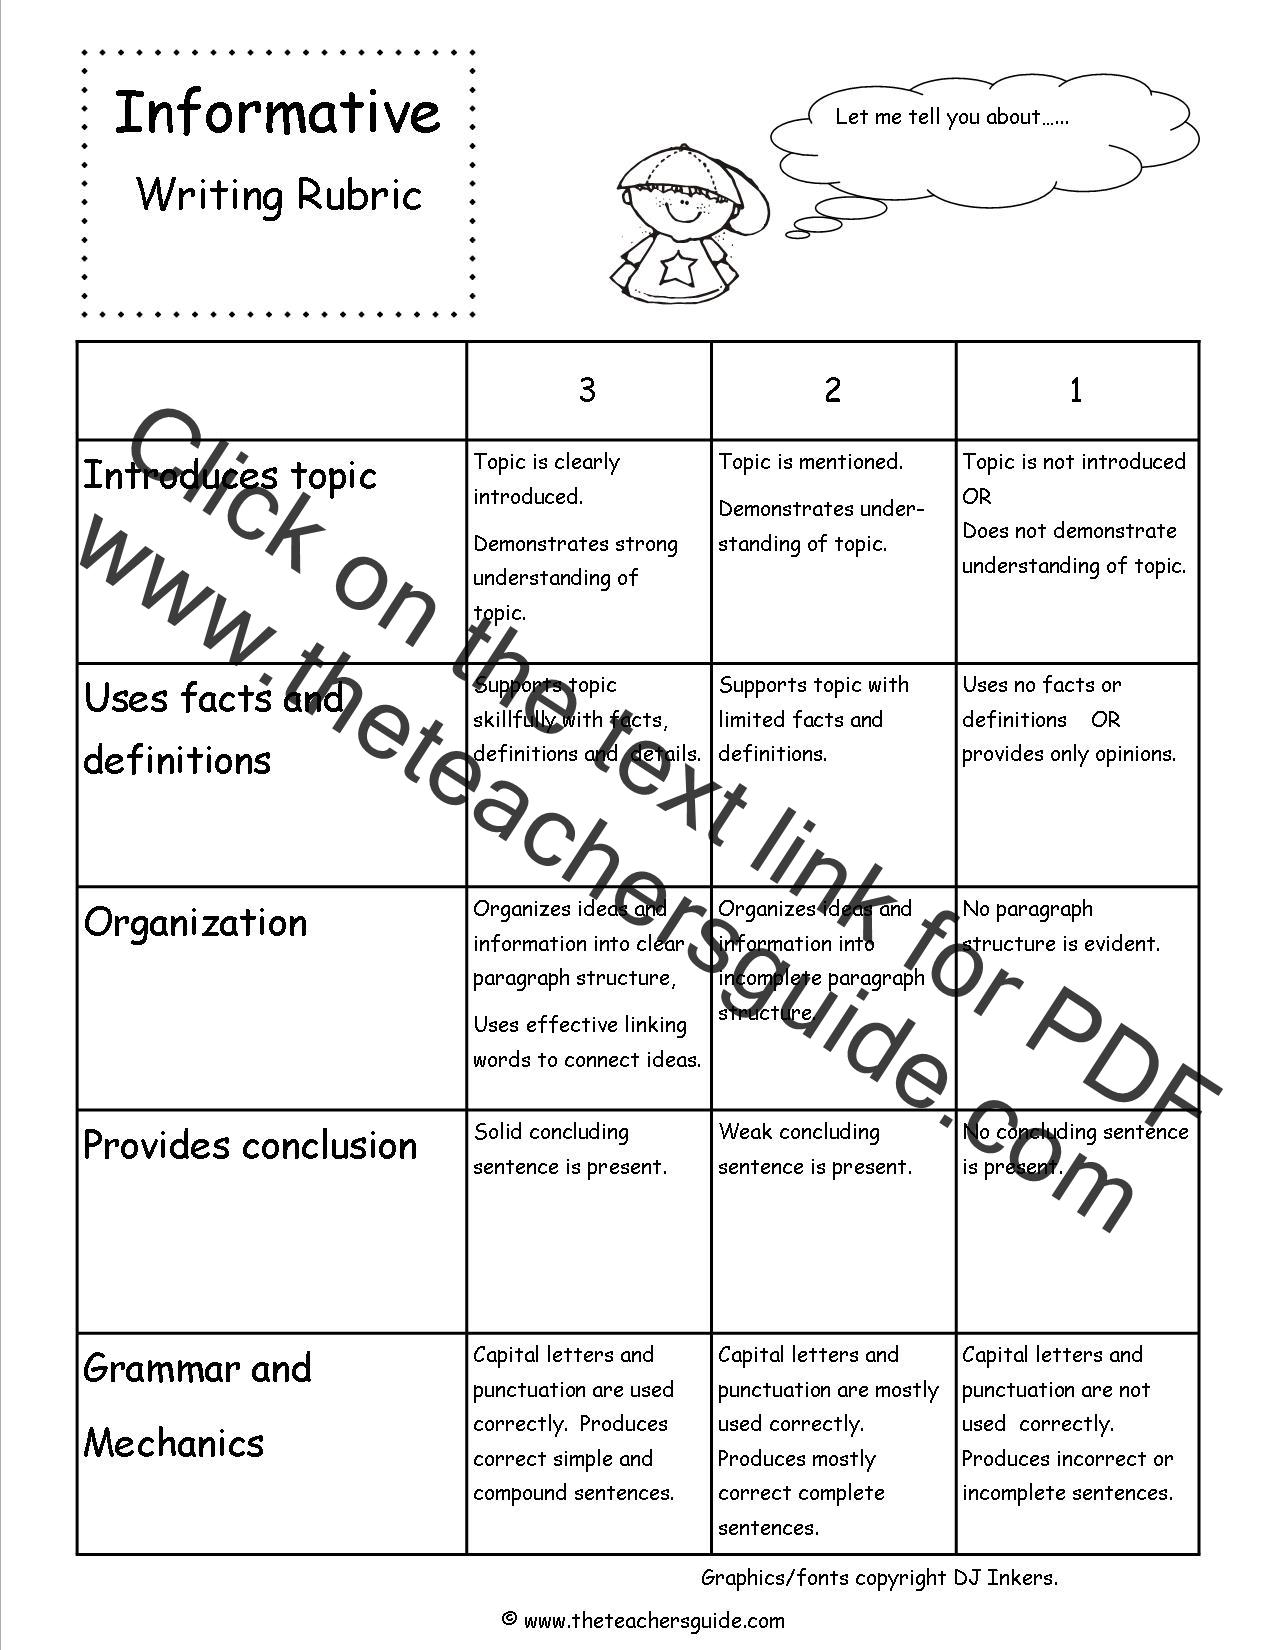 writing rubric for 5th grade Grades 4 -5-6 persuasive writing rubric focus content & development organization style (voice) conventions (grammar, punctuation, capitalization, mechanics.